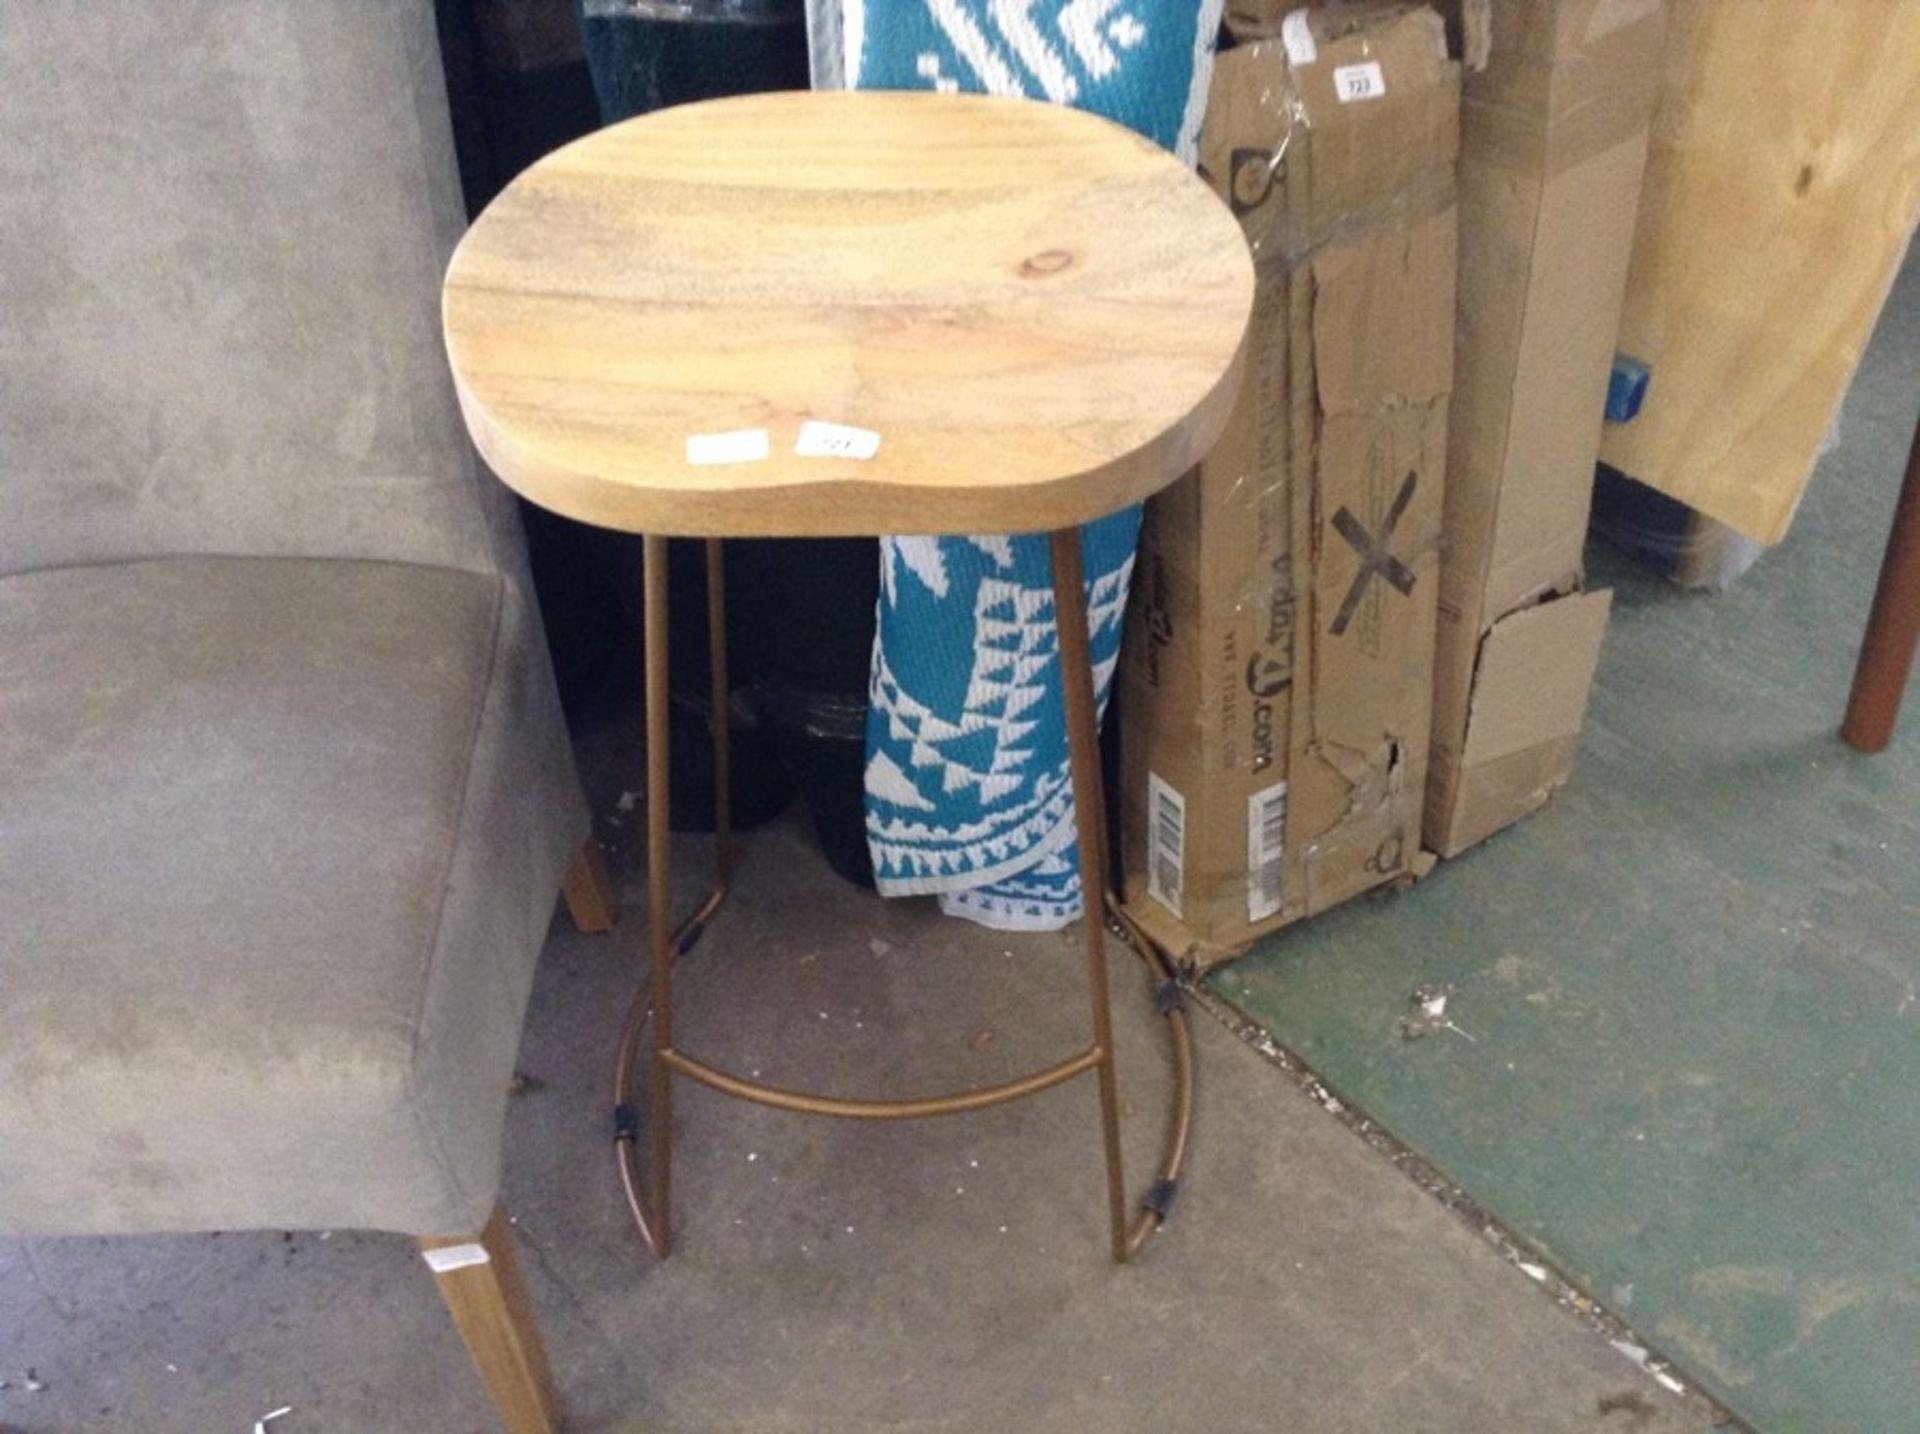 Lot 588 - 17 Stories,Wayman 80cm Bar Stool - RRP £85.99 (MBZ